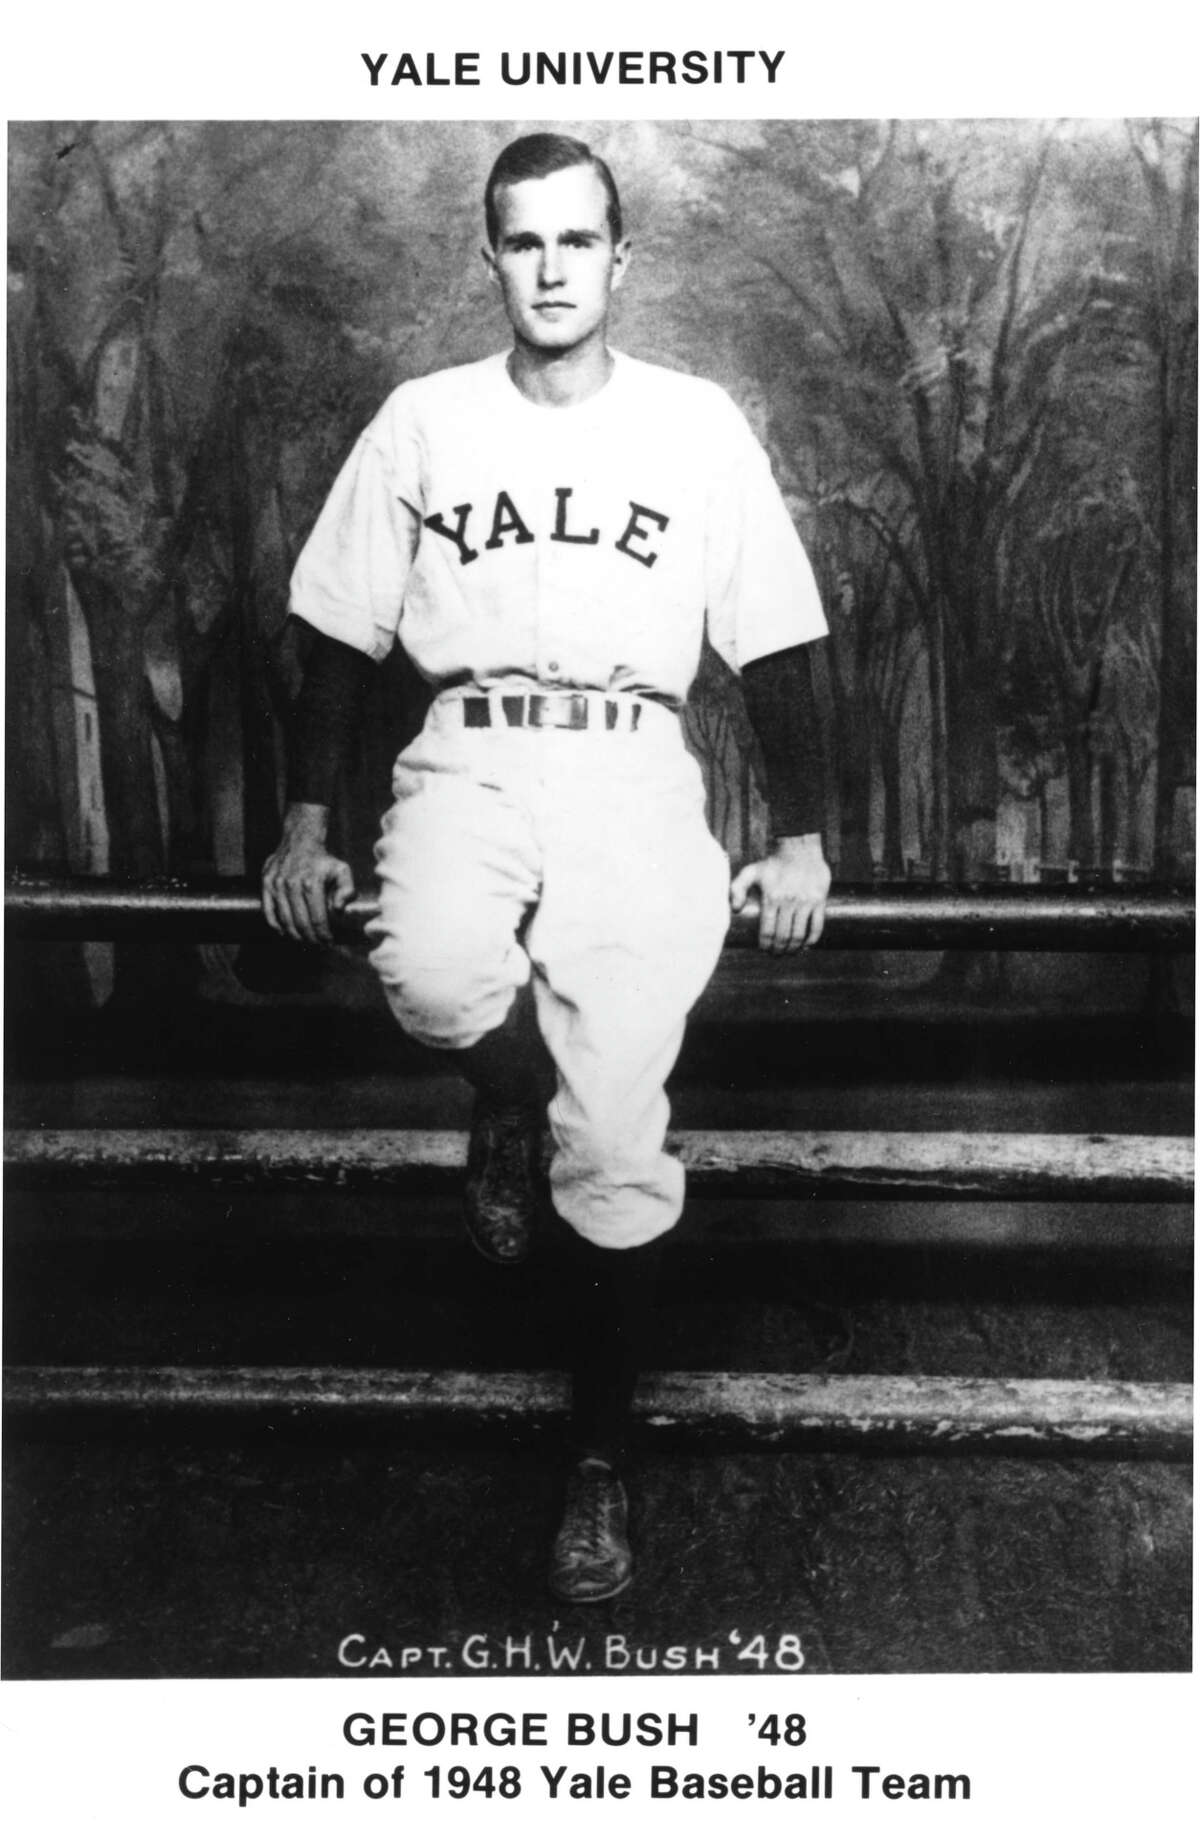 Captain of the 1948 Yale Baseball Team, George H.W. Bush.